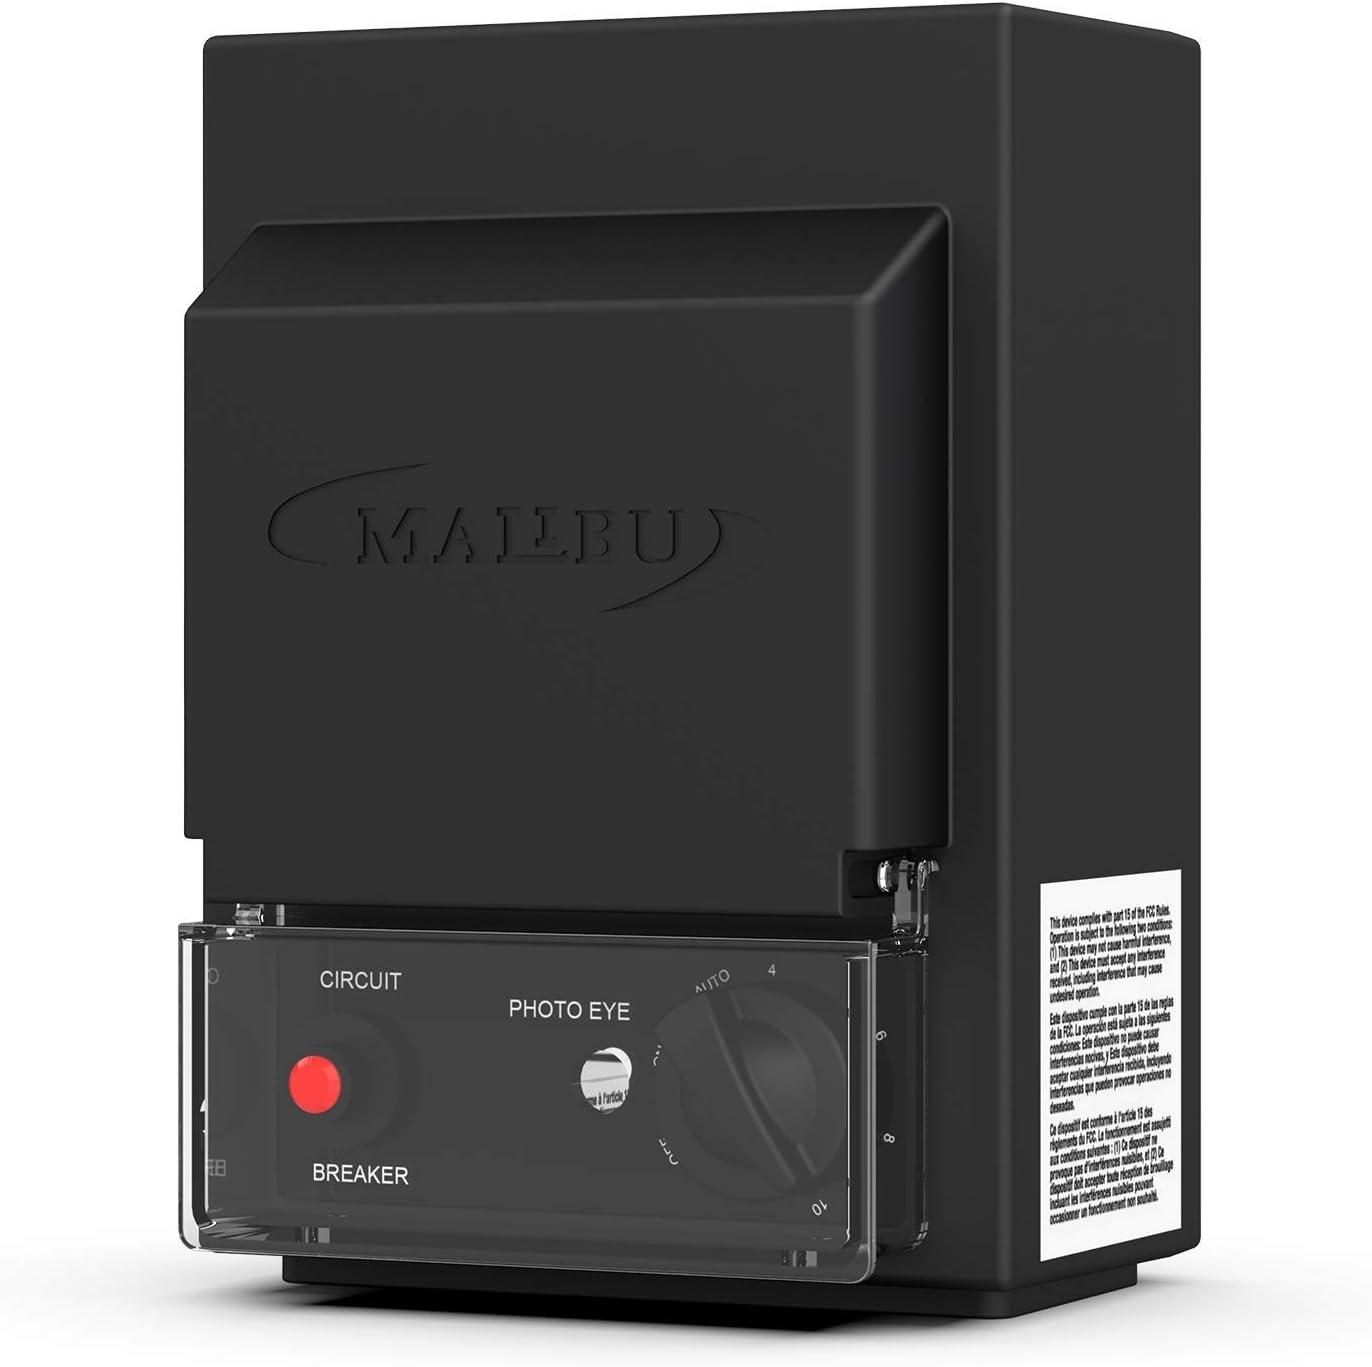 Malibu 3100-1120-01-120 Watt Low Voltage Power Pack Transformer, w/Photo Eye Sensor and Timer, Black Matte